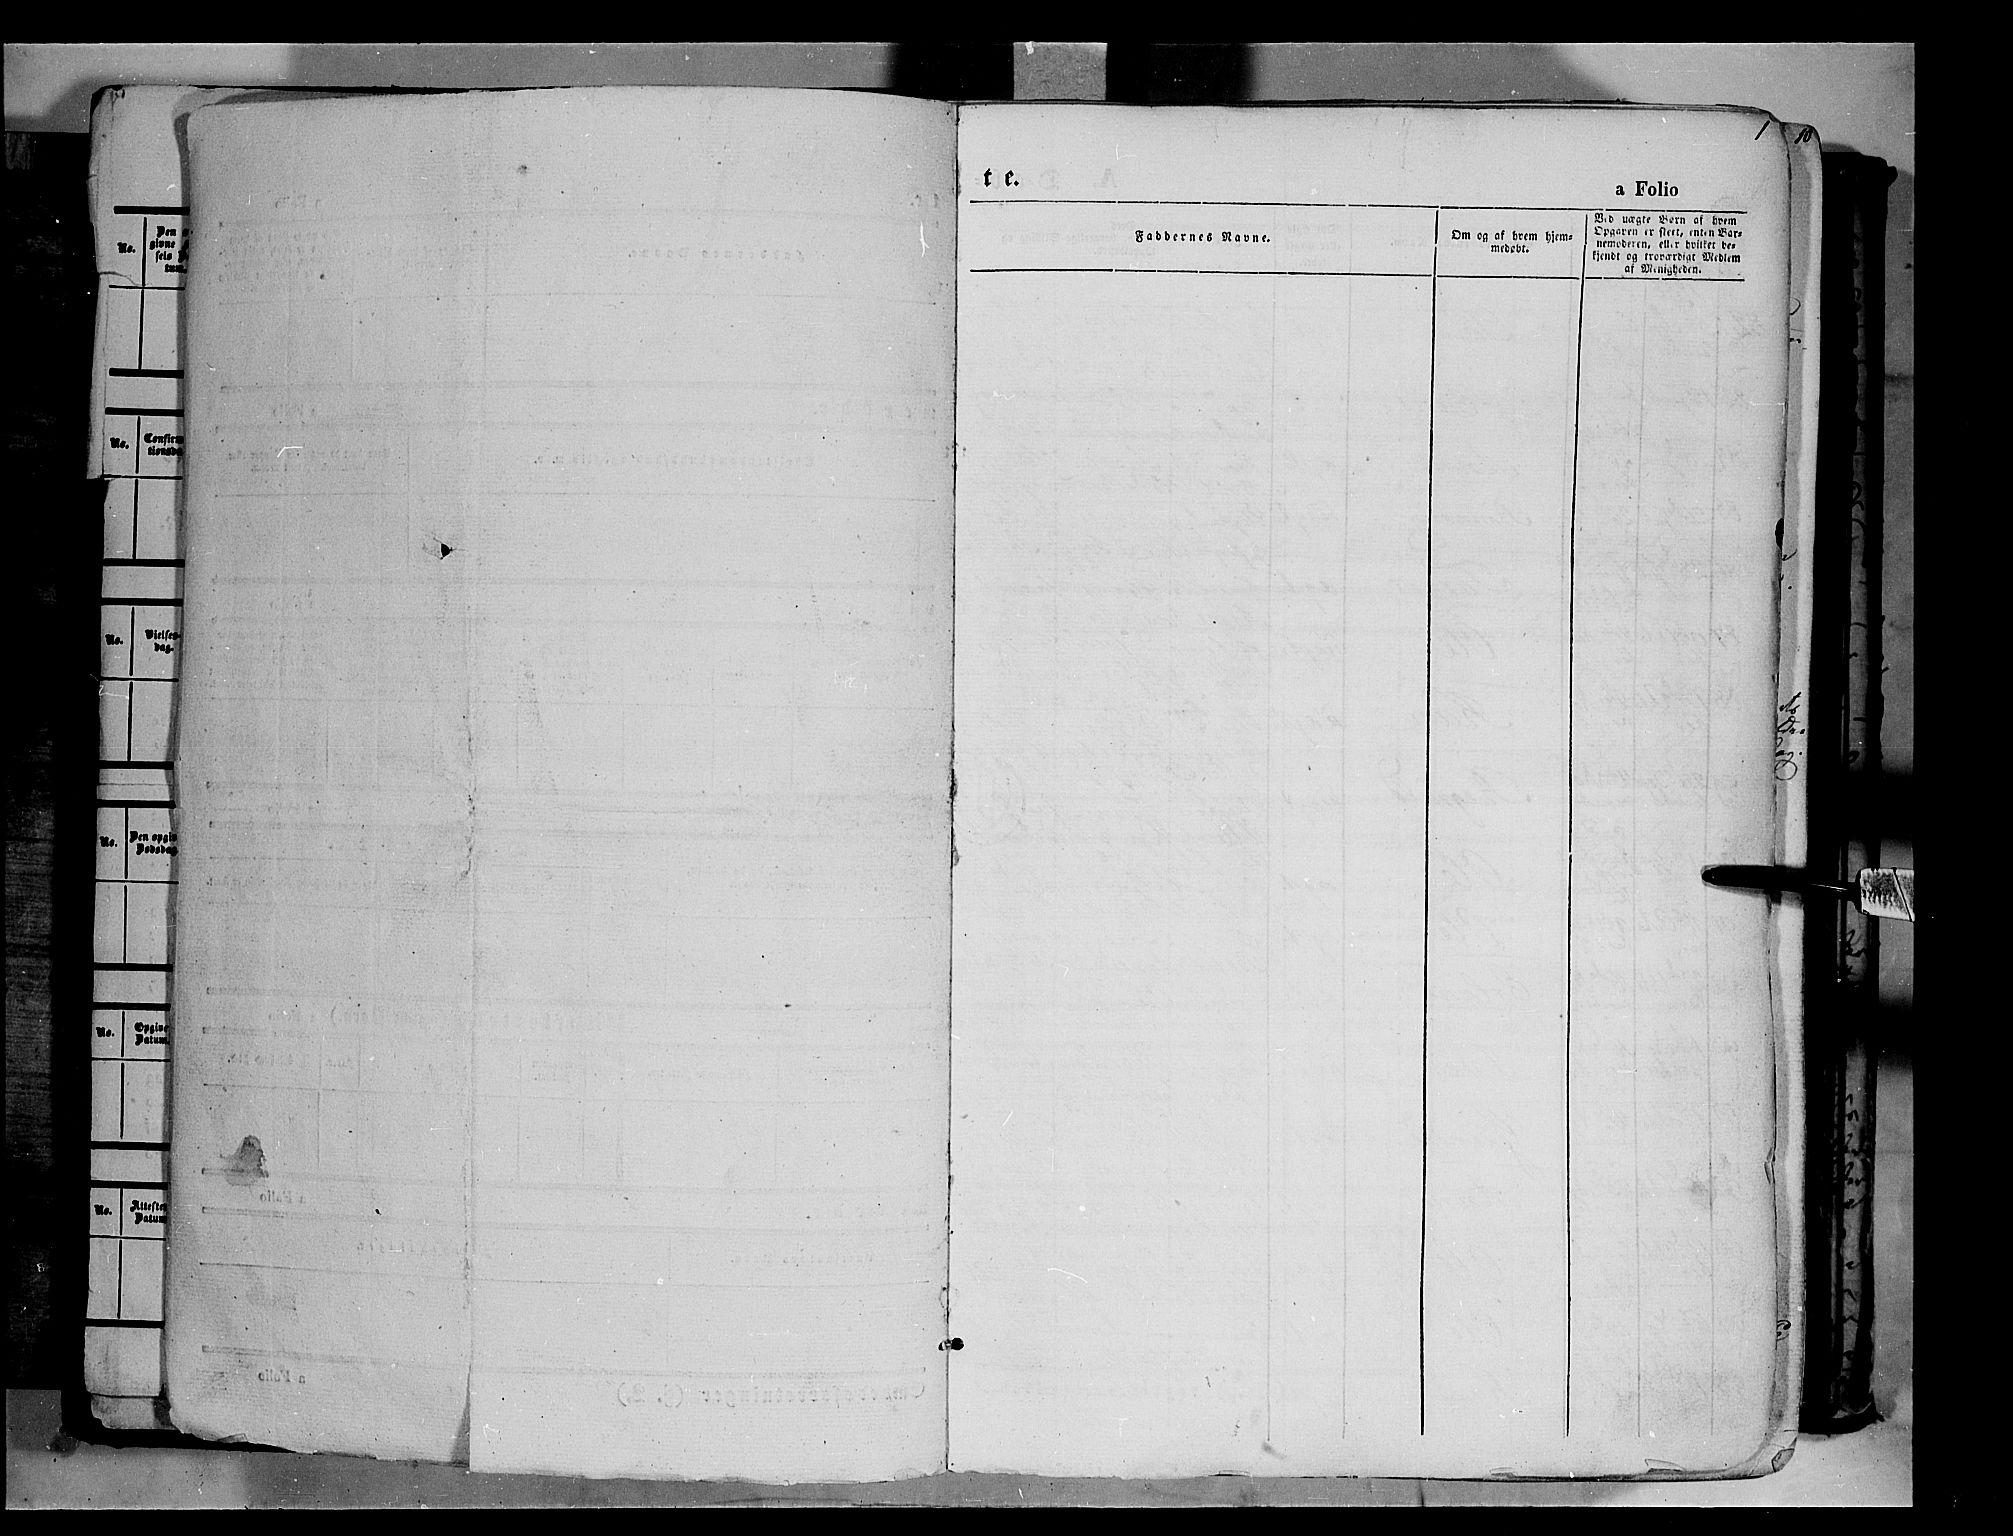 SAH, Vågå prestekontor, Ministerialbok nr. 6 /1, 1856-1872, s. 1